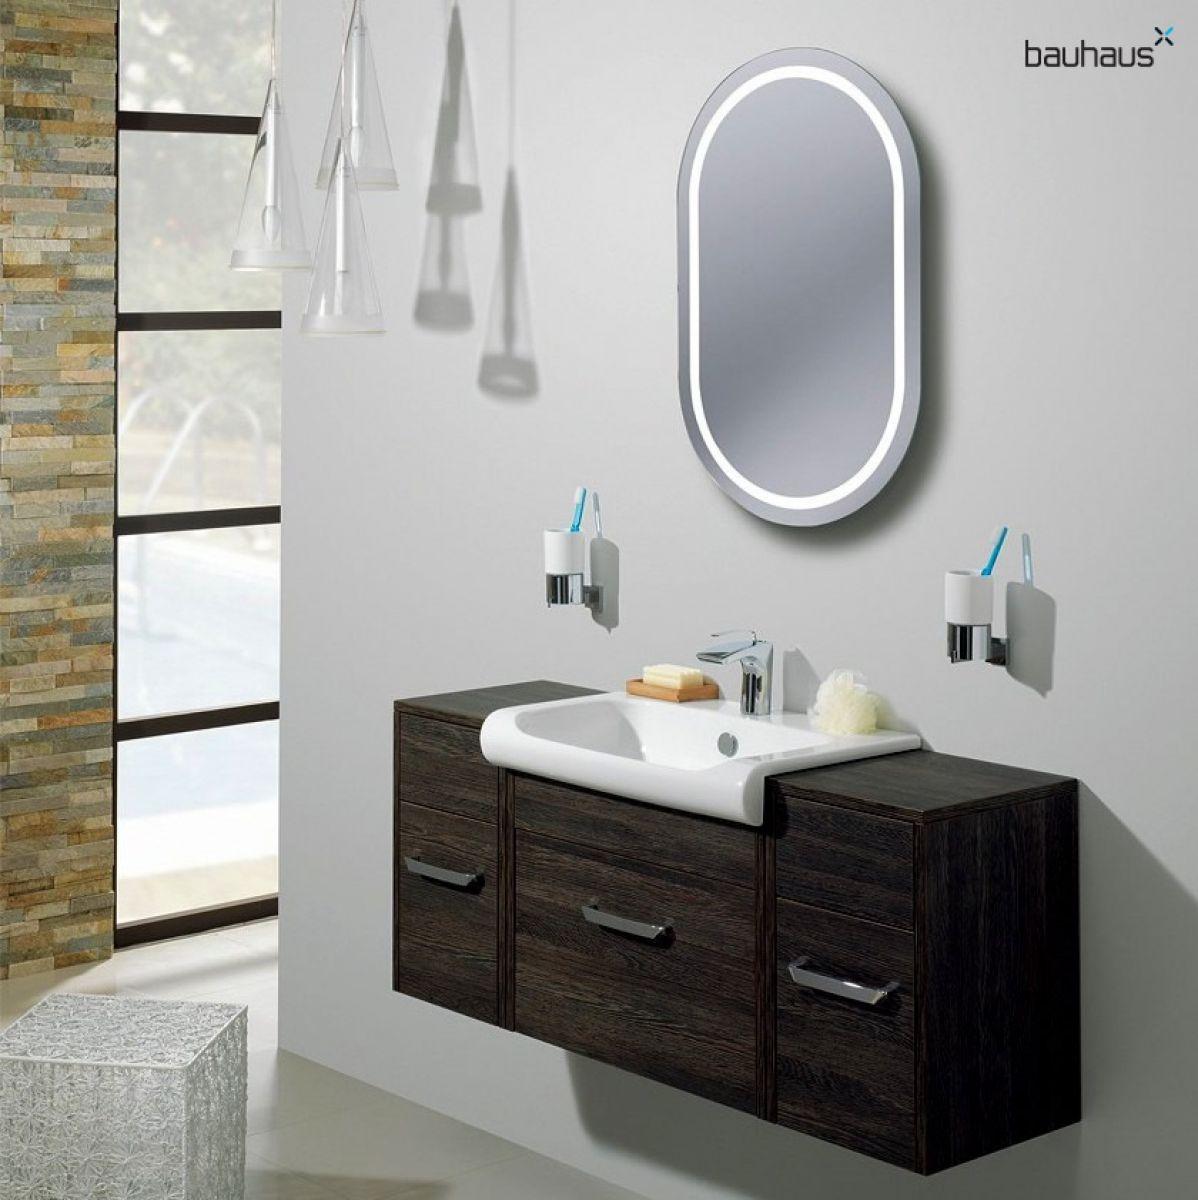 Bauhaus Essence Backlit Oval Mirror Uk Bathrooms